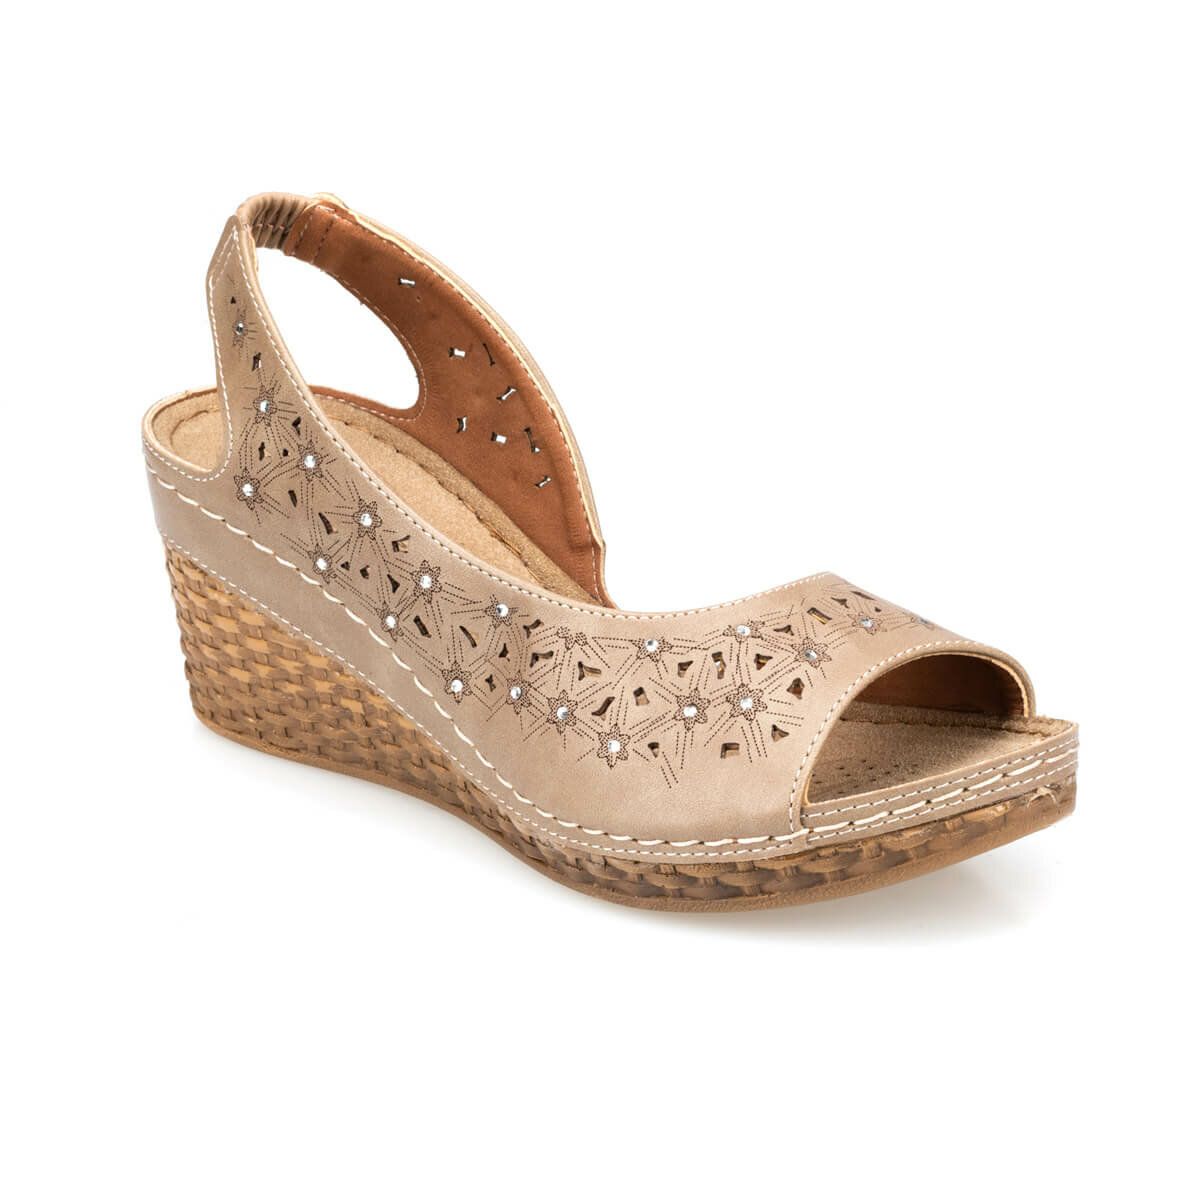 FLO Women Sandals Sand Color Women Sandals Breathable Comfortable Slippers Summer Shoes Женские сандалии 91.157342.Z Polaris